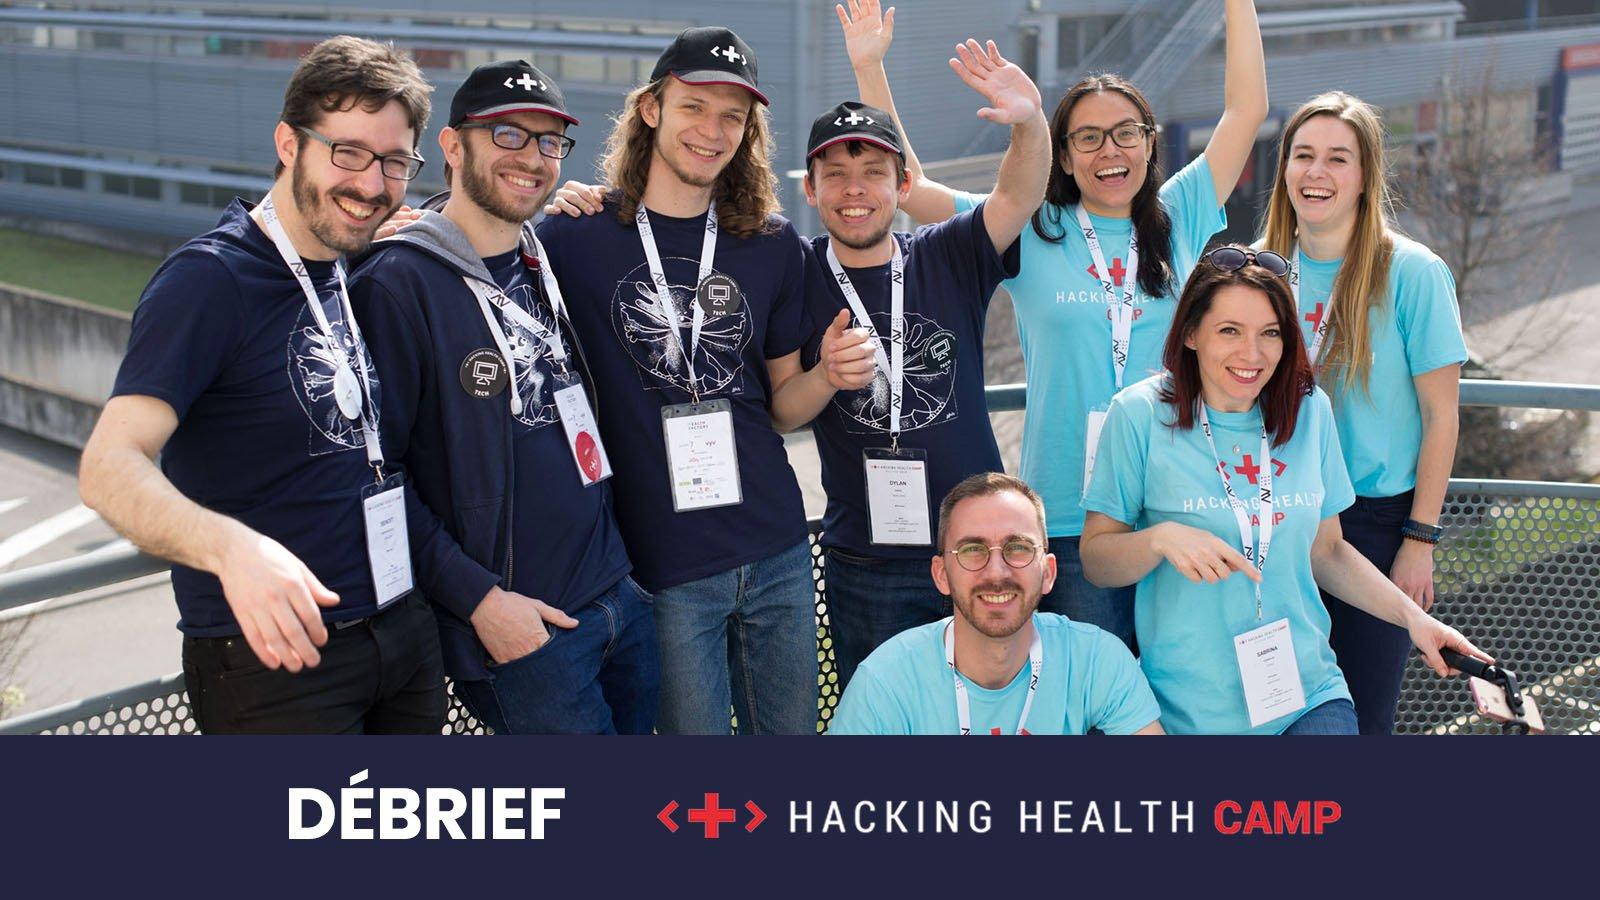 Débrief - Hacking Health Camp 2019 - SFEIR